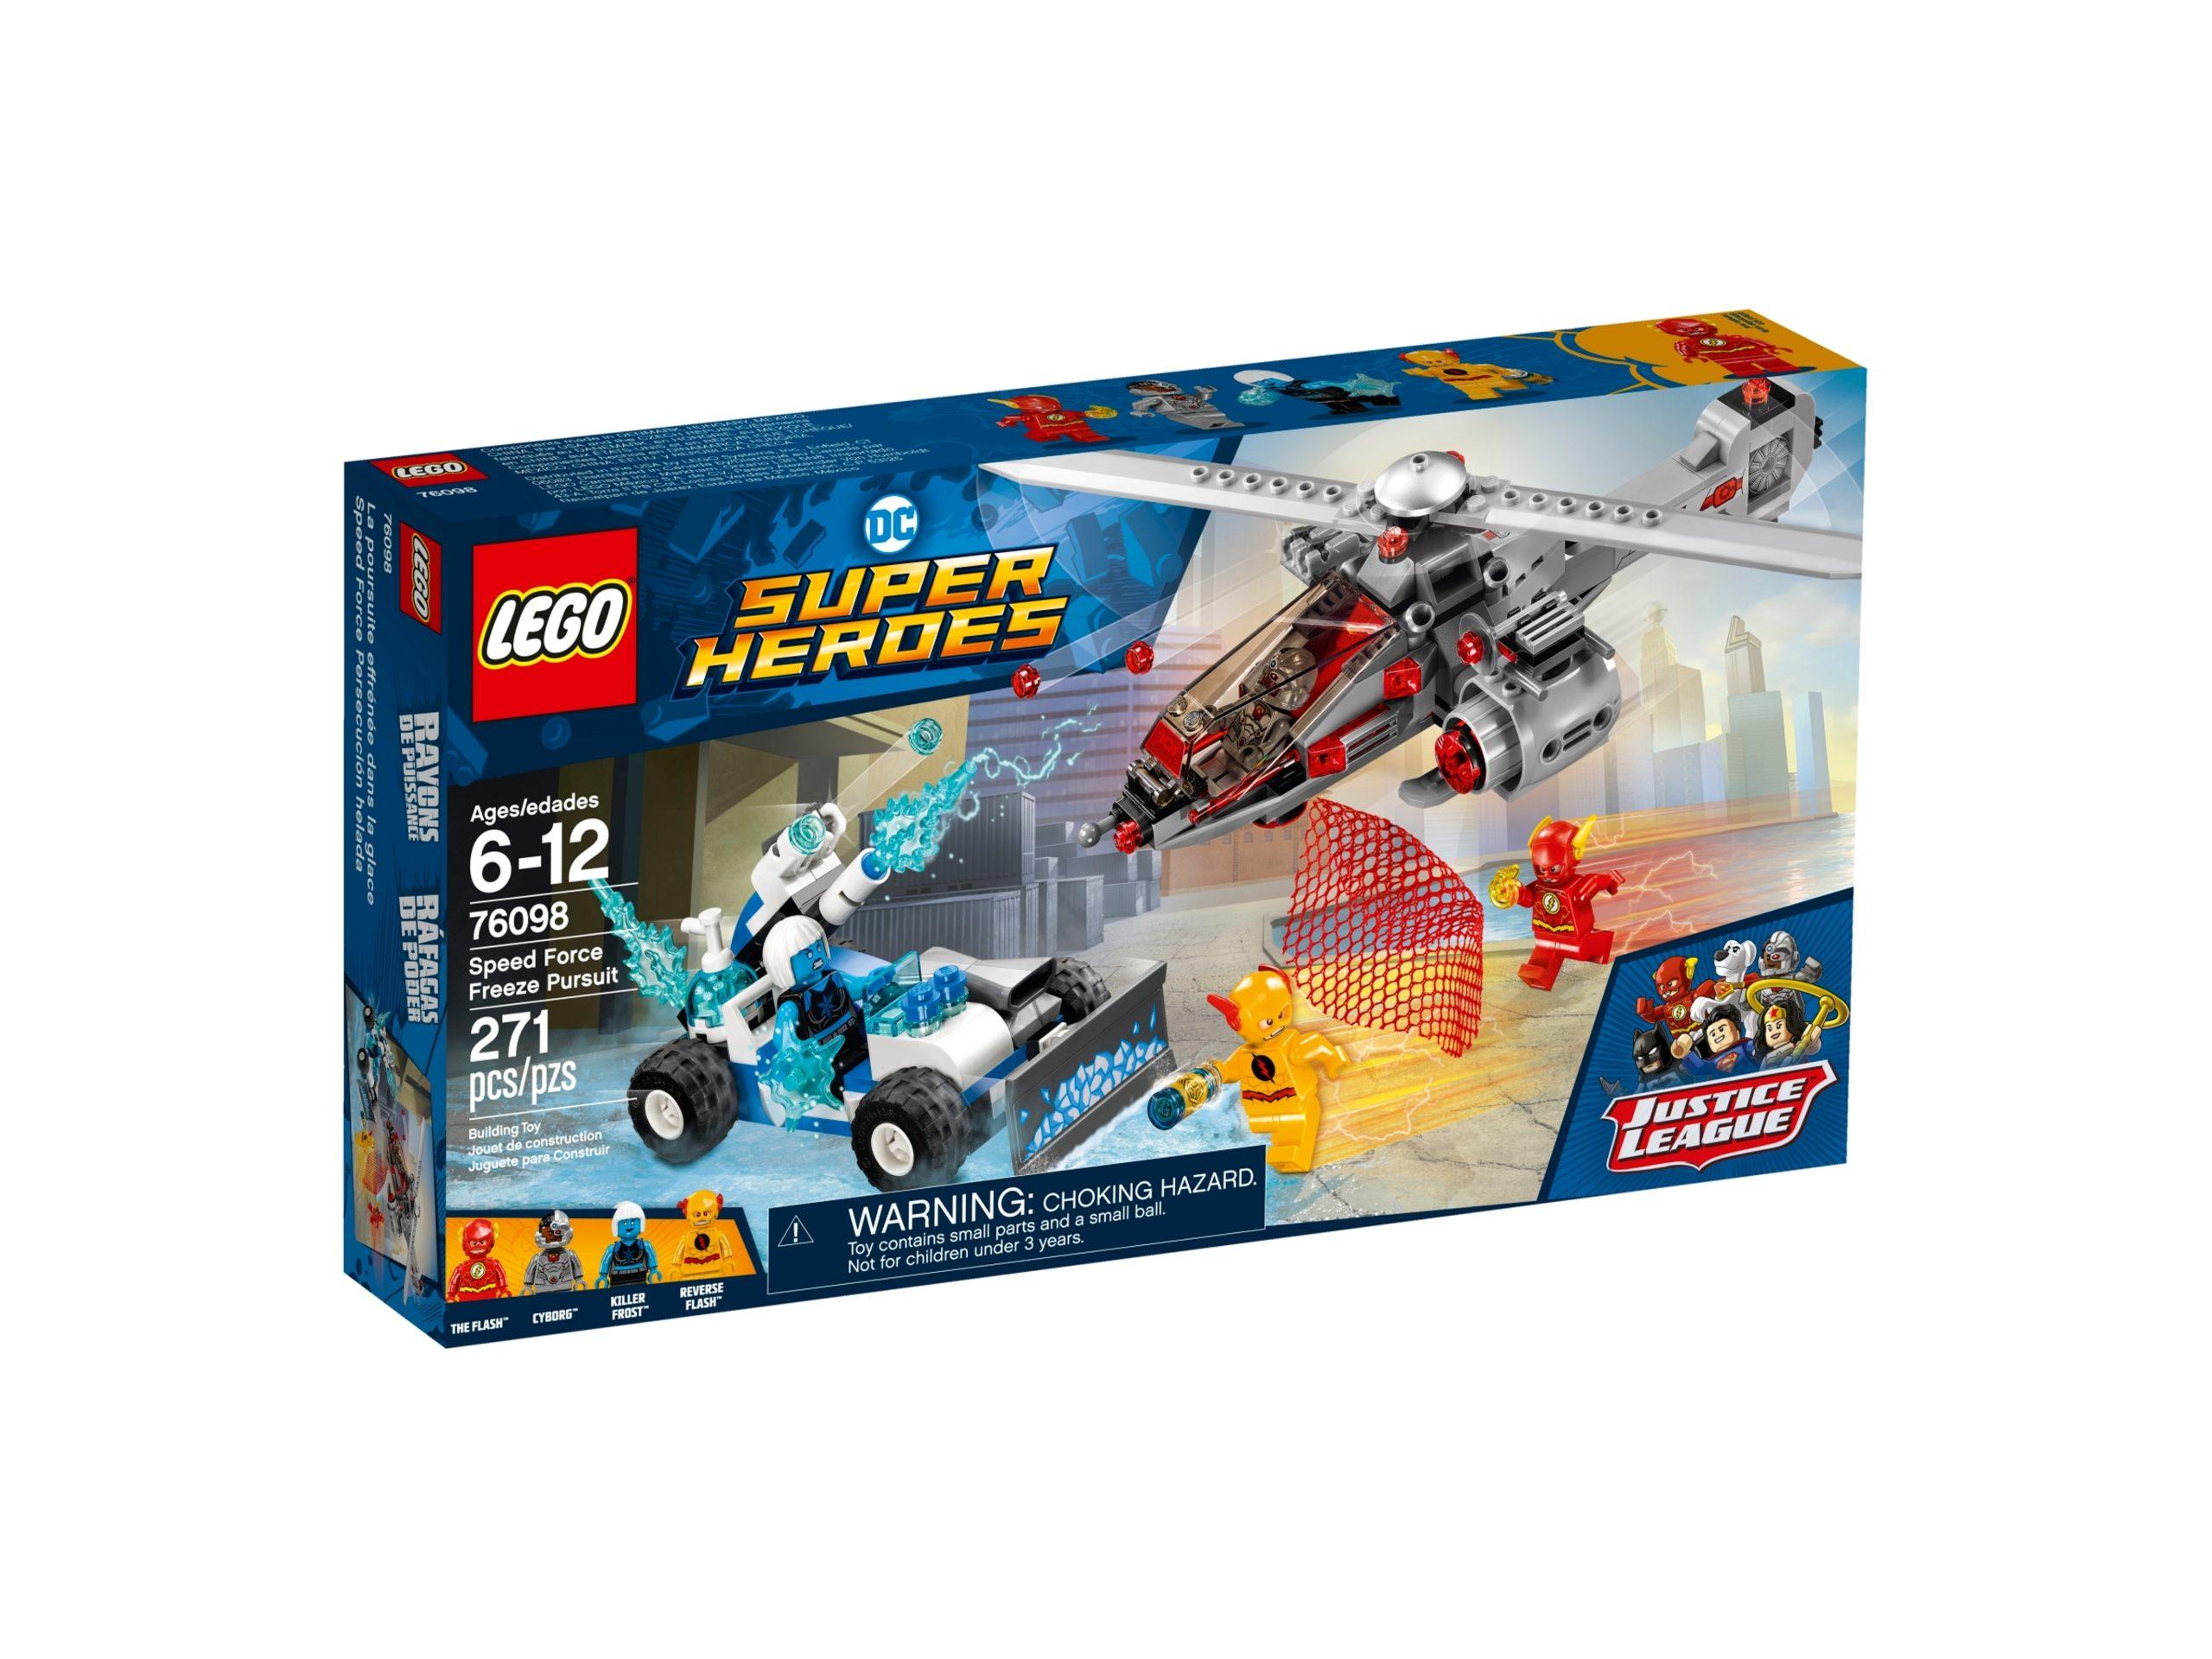 lego 76098 speed force freeze verfolgungsjagd scaled